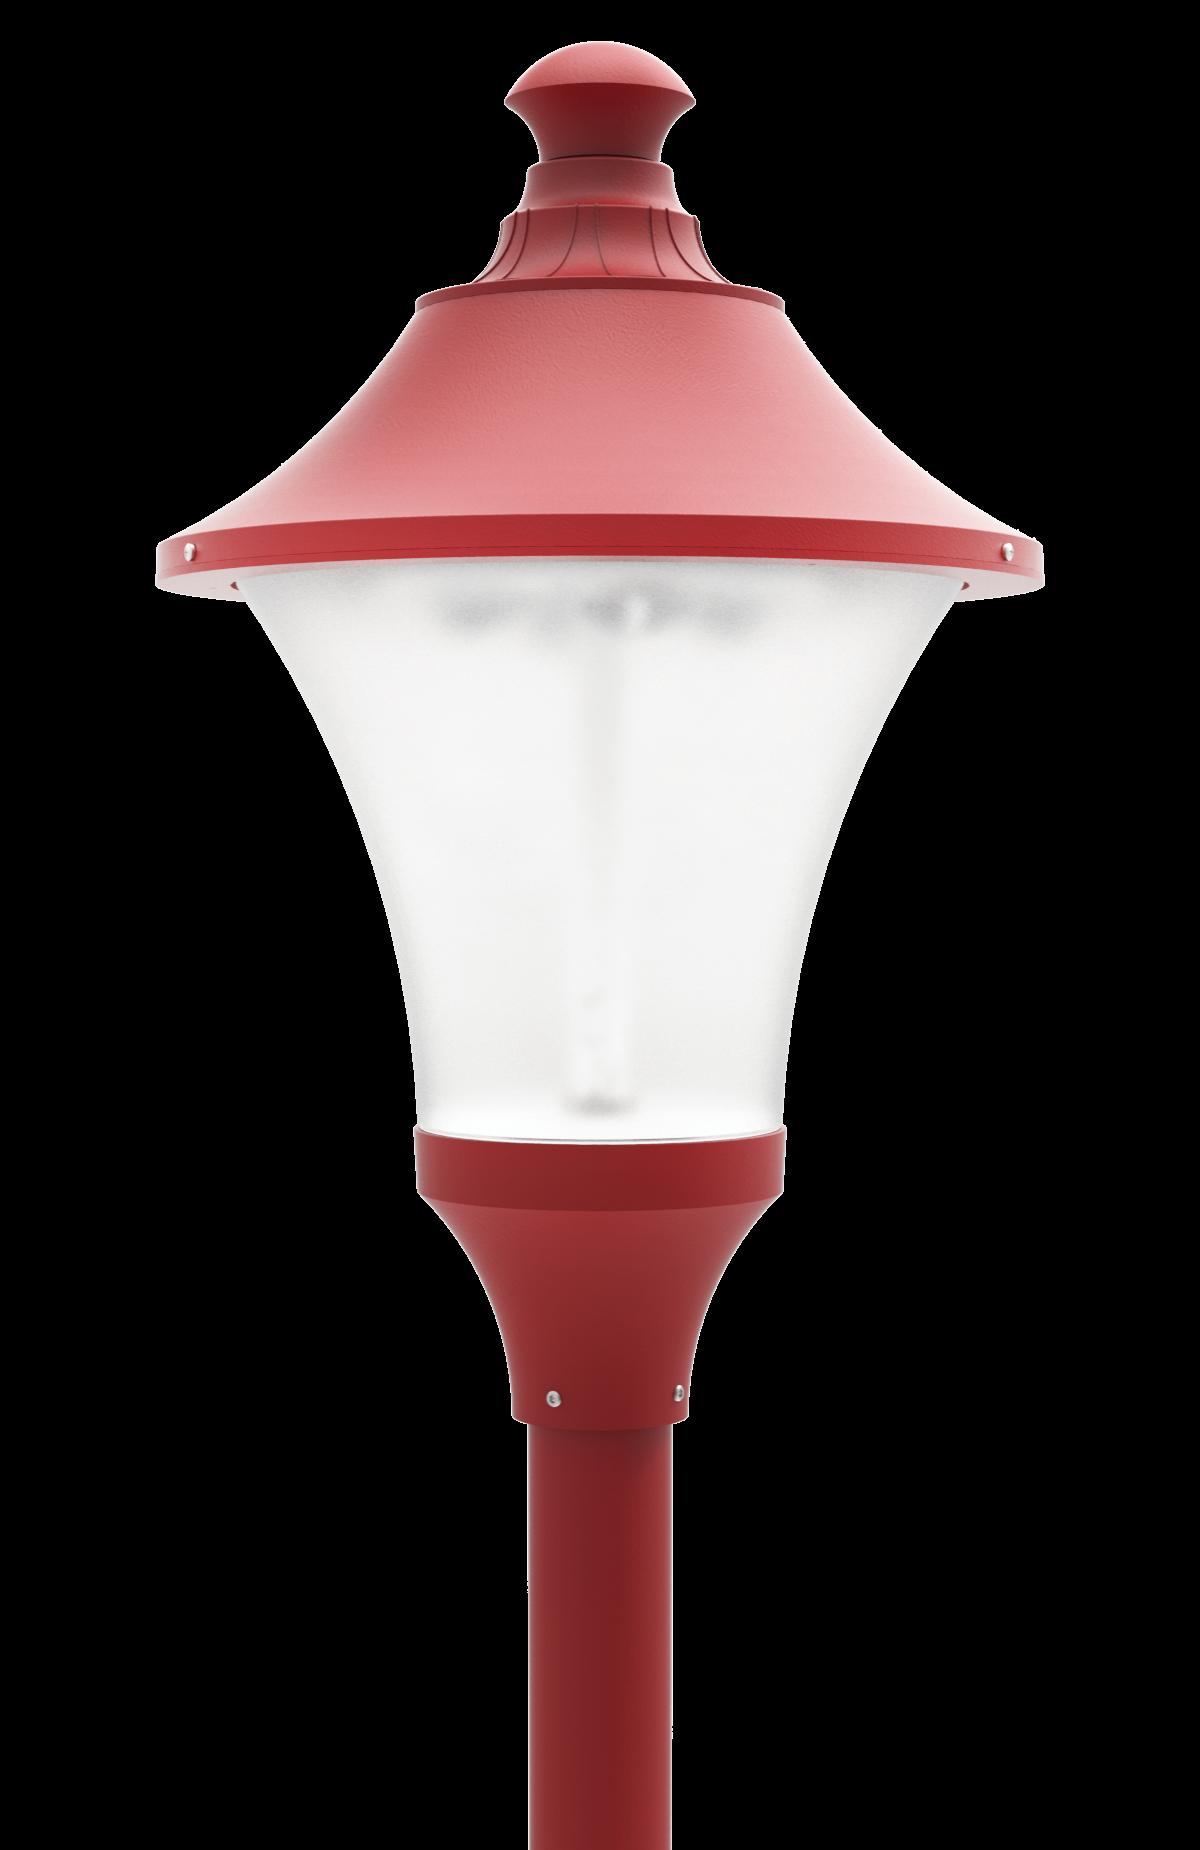 Led Post Top Light Fixtures 643 Series Dukelight Com 643 Light Fixtures Fixtures Light